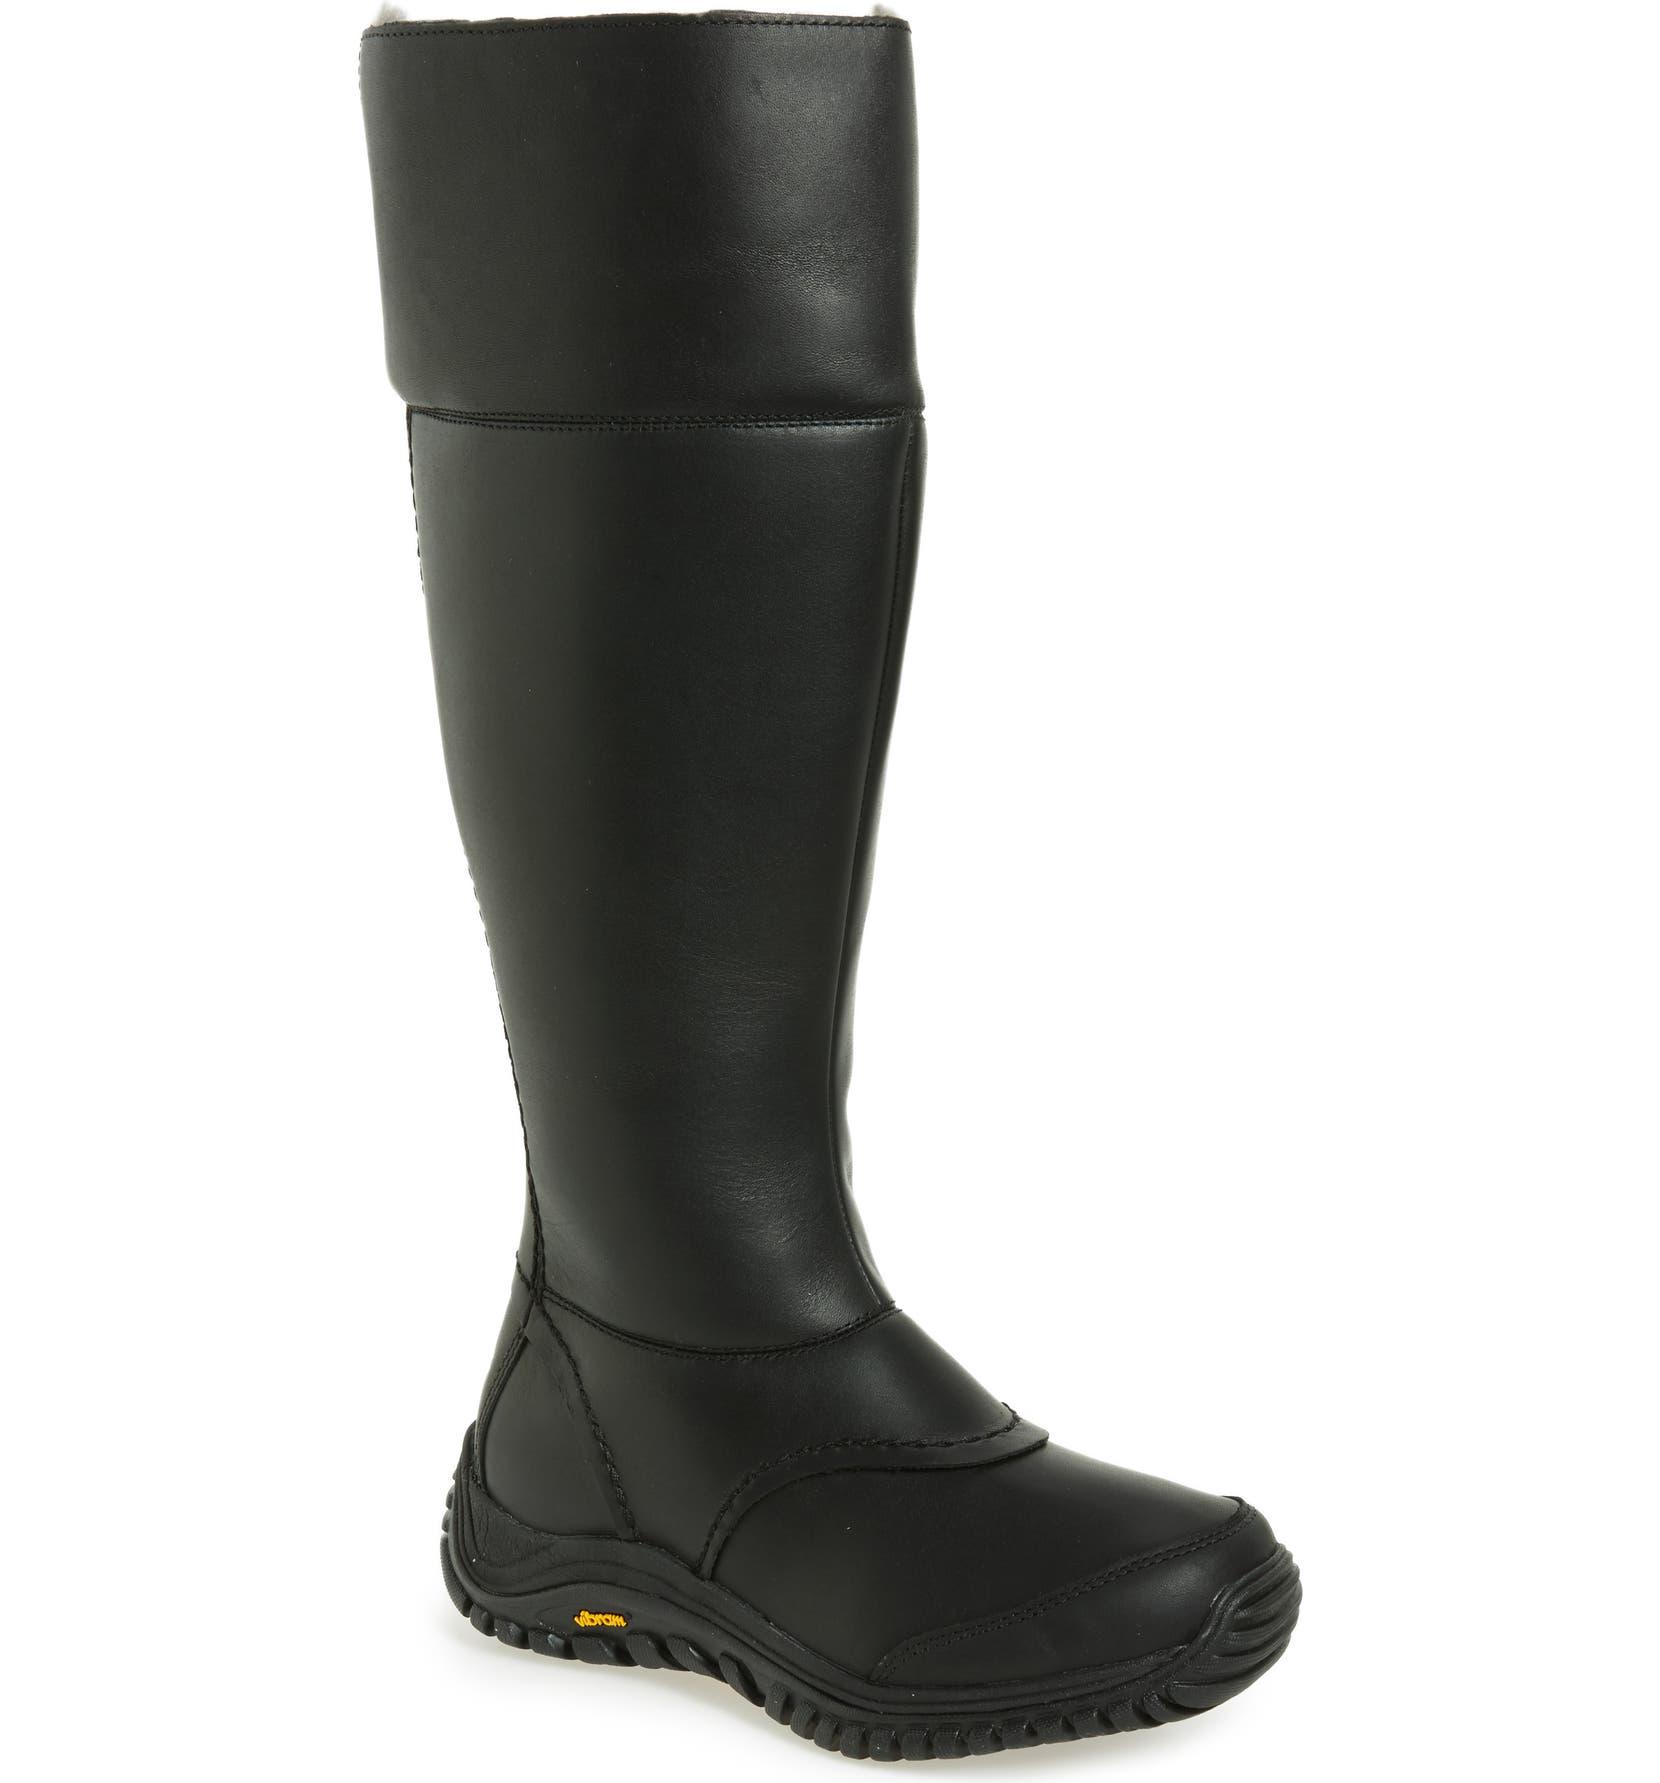 e75a7994f99 Miko Waterproof Boot